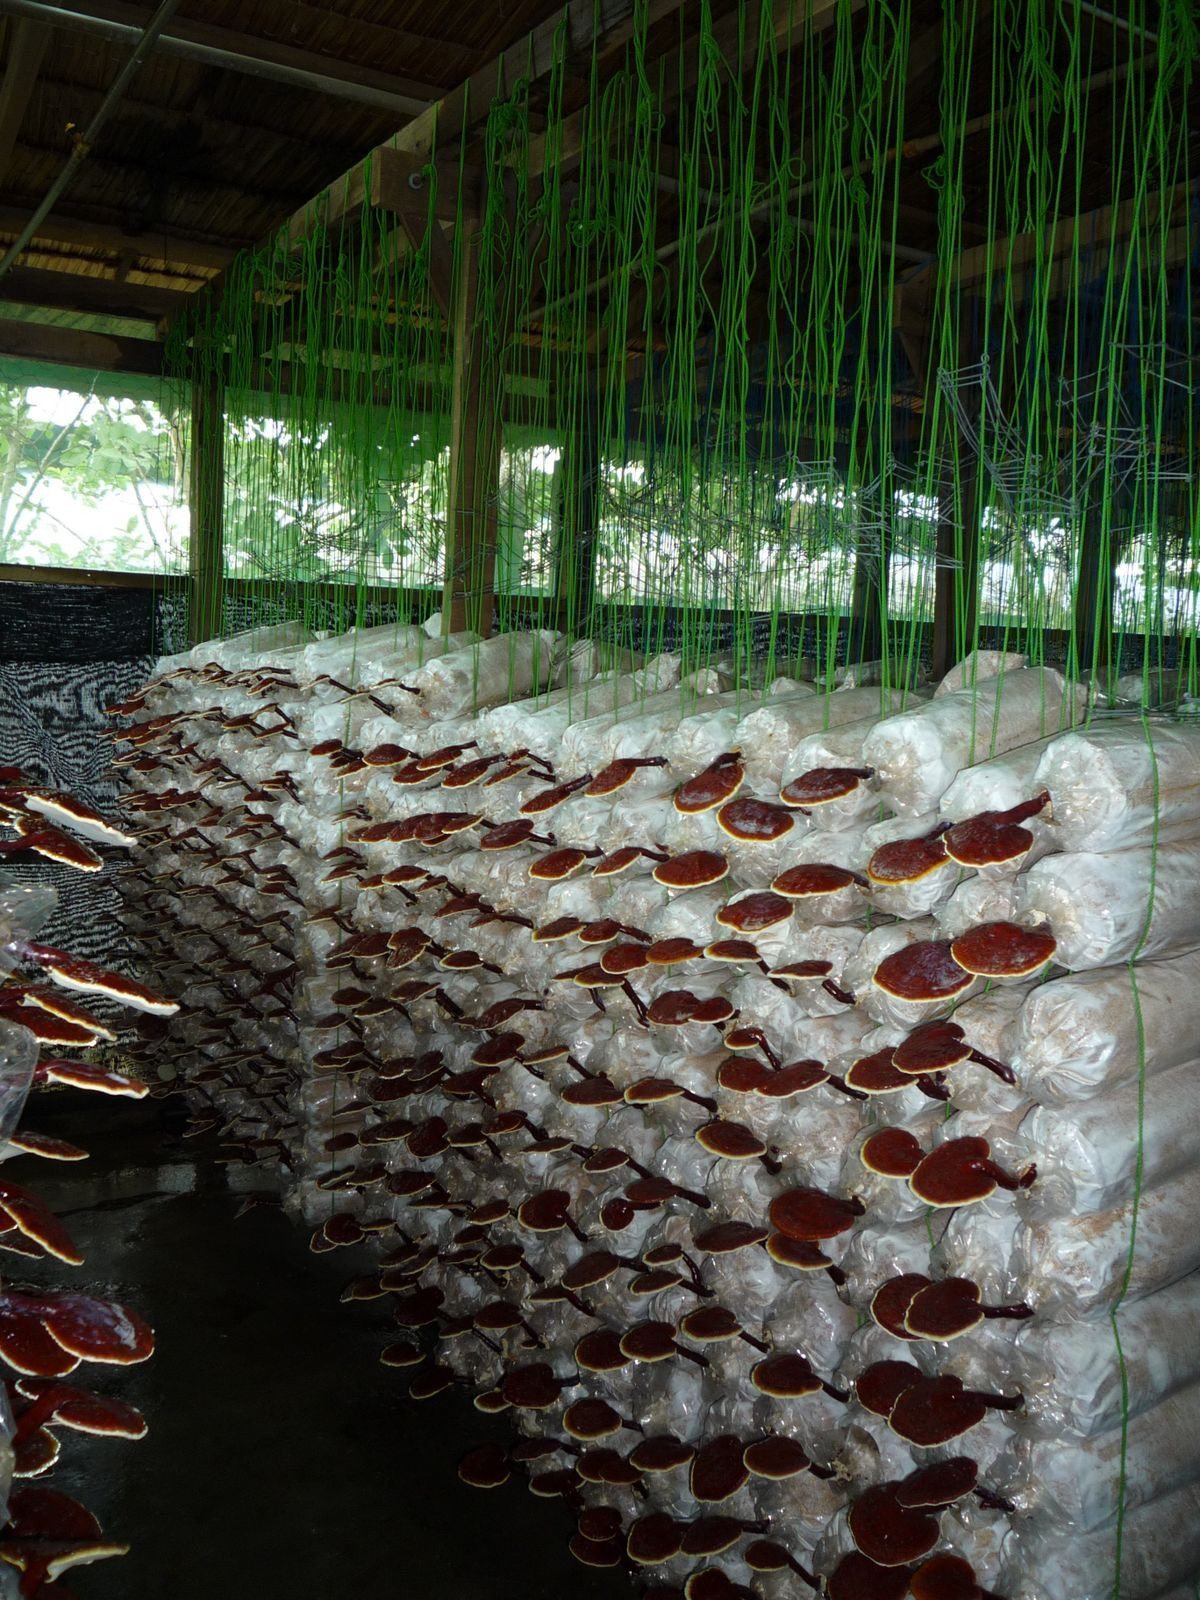 Dxn Ganoderma Farm Where All Those Mushrooms Are Grown